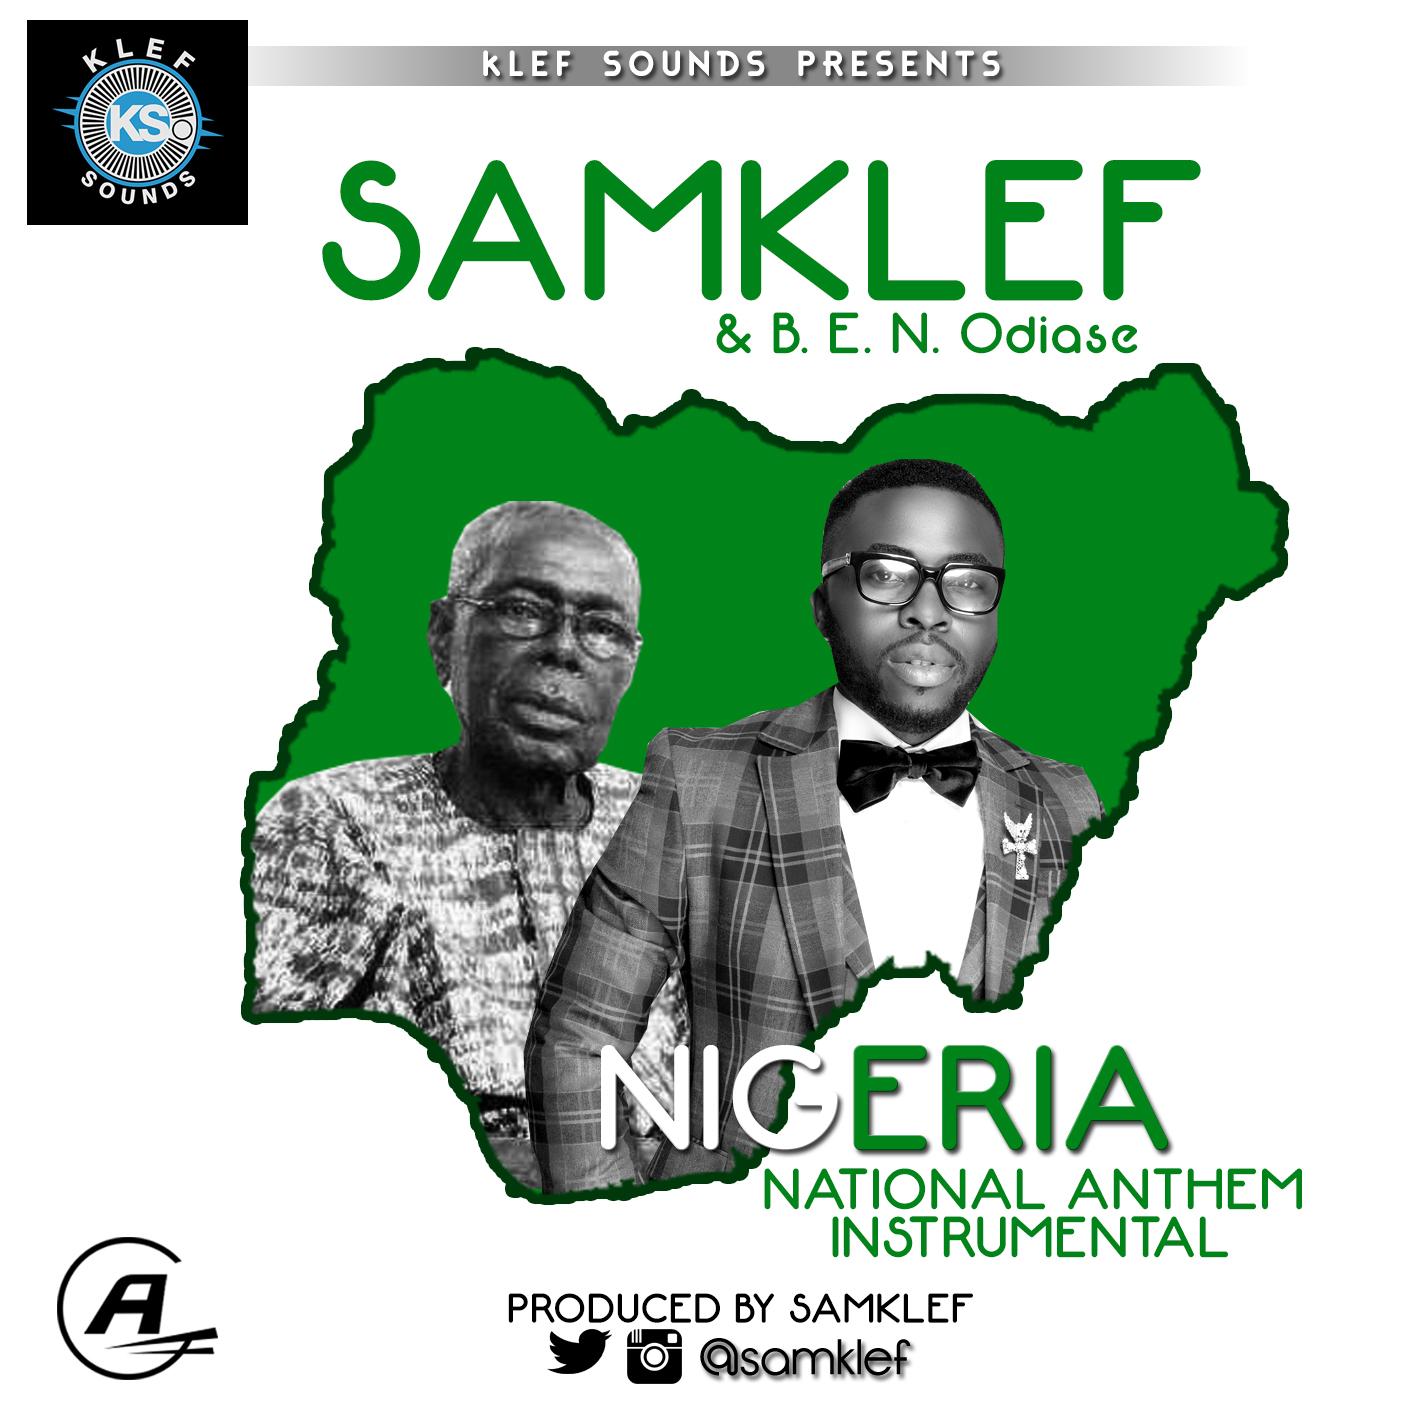 Nigerian national anthem nigerians | download + lyrics.